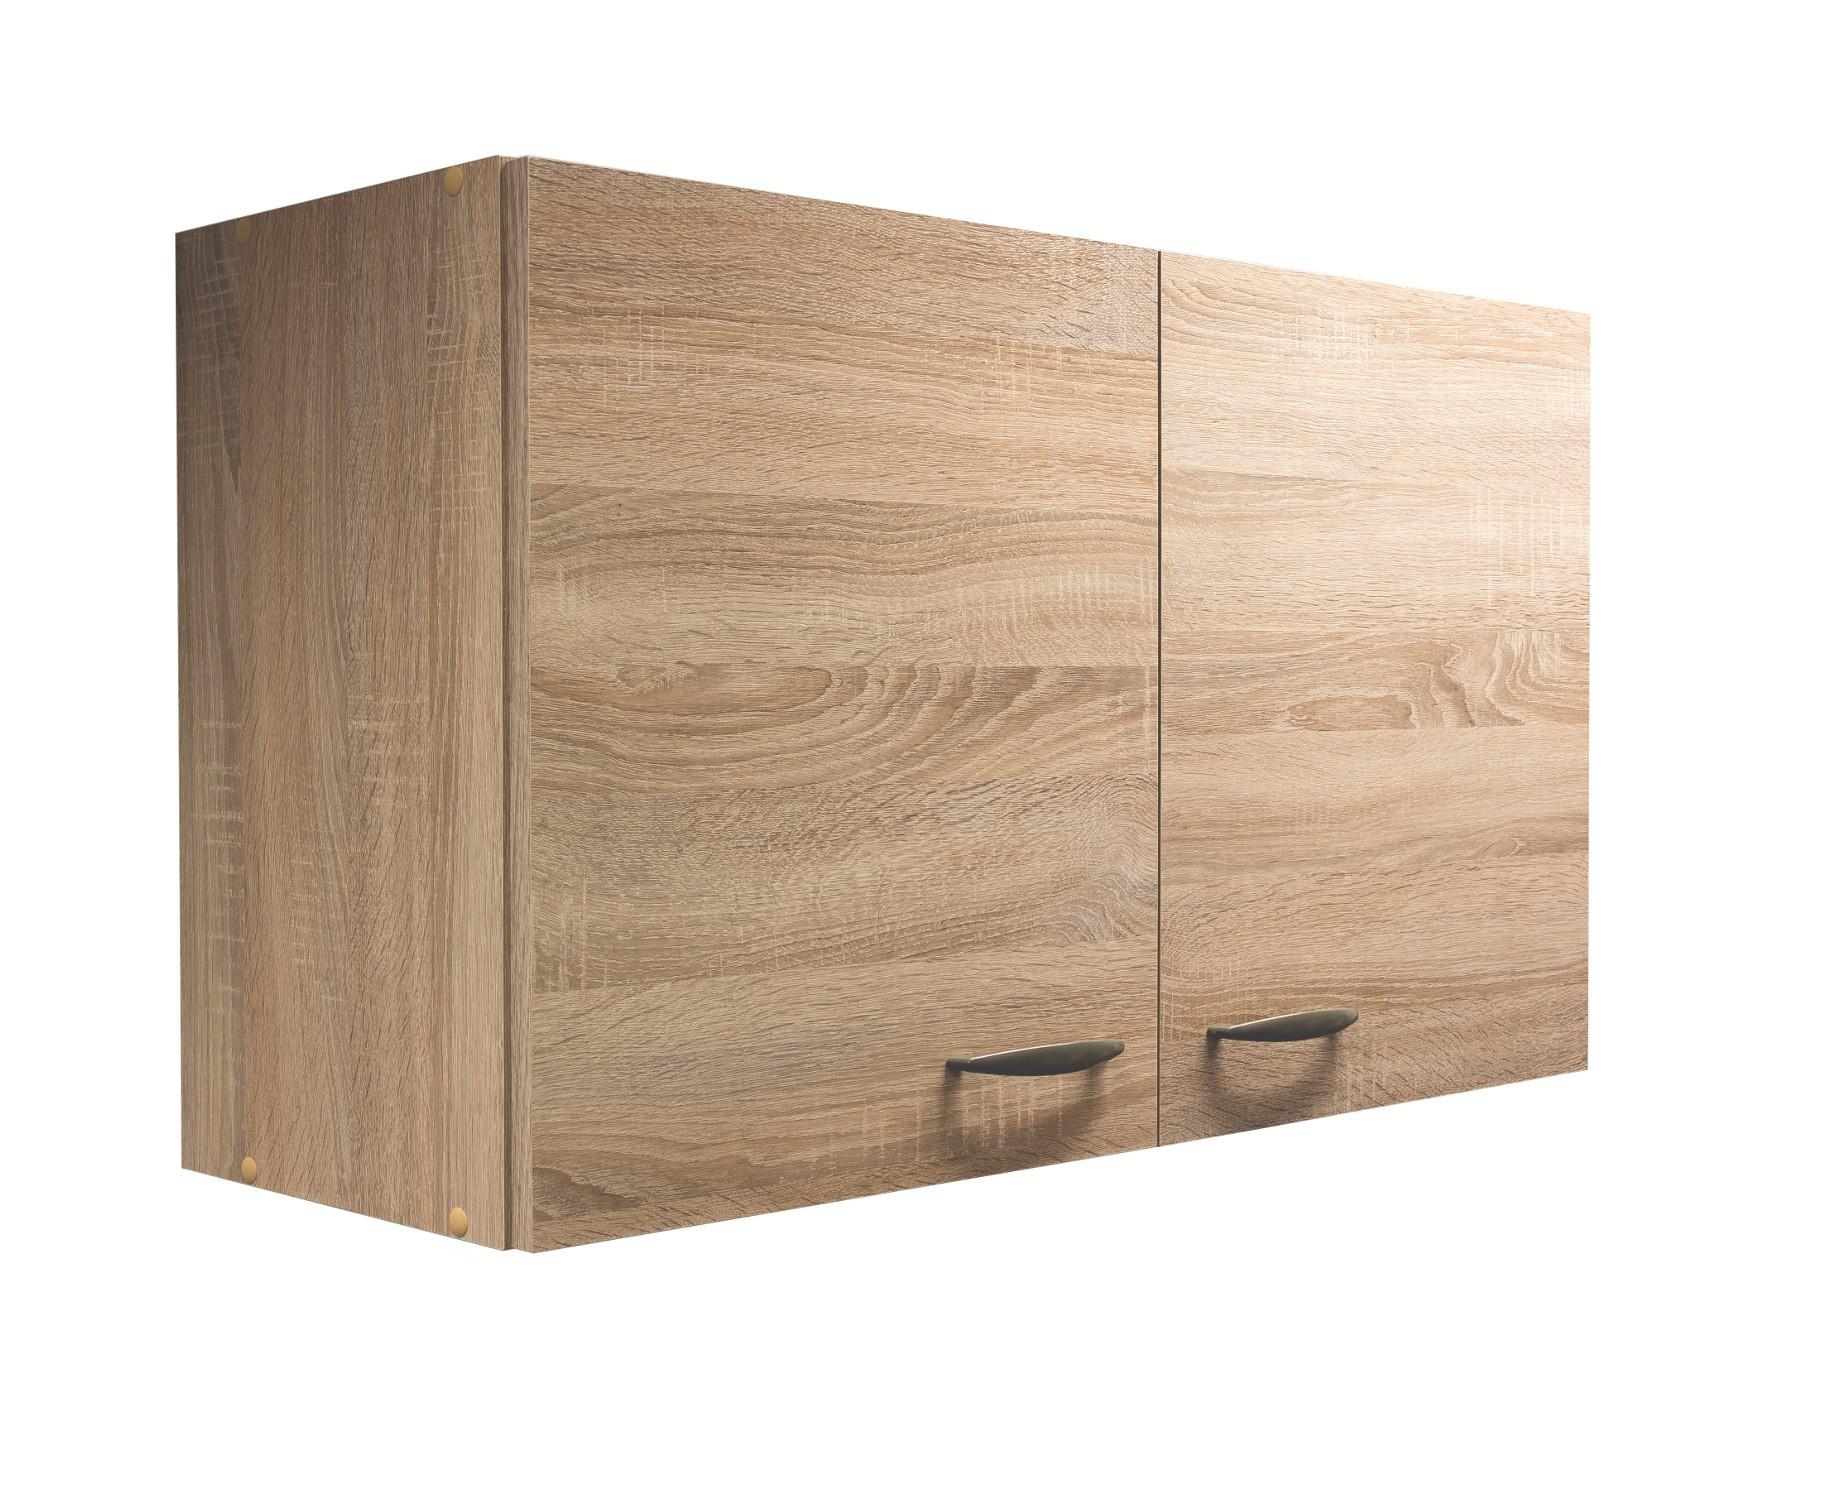 k chen h ngeschrank herne 2 t rig 100 cm breit eiche sonoma k che k chen h ngeschr nke. Black Bedroom Furniture Sets. Home Design Ideas